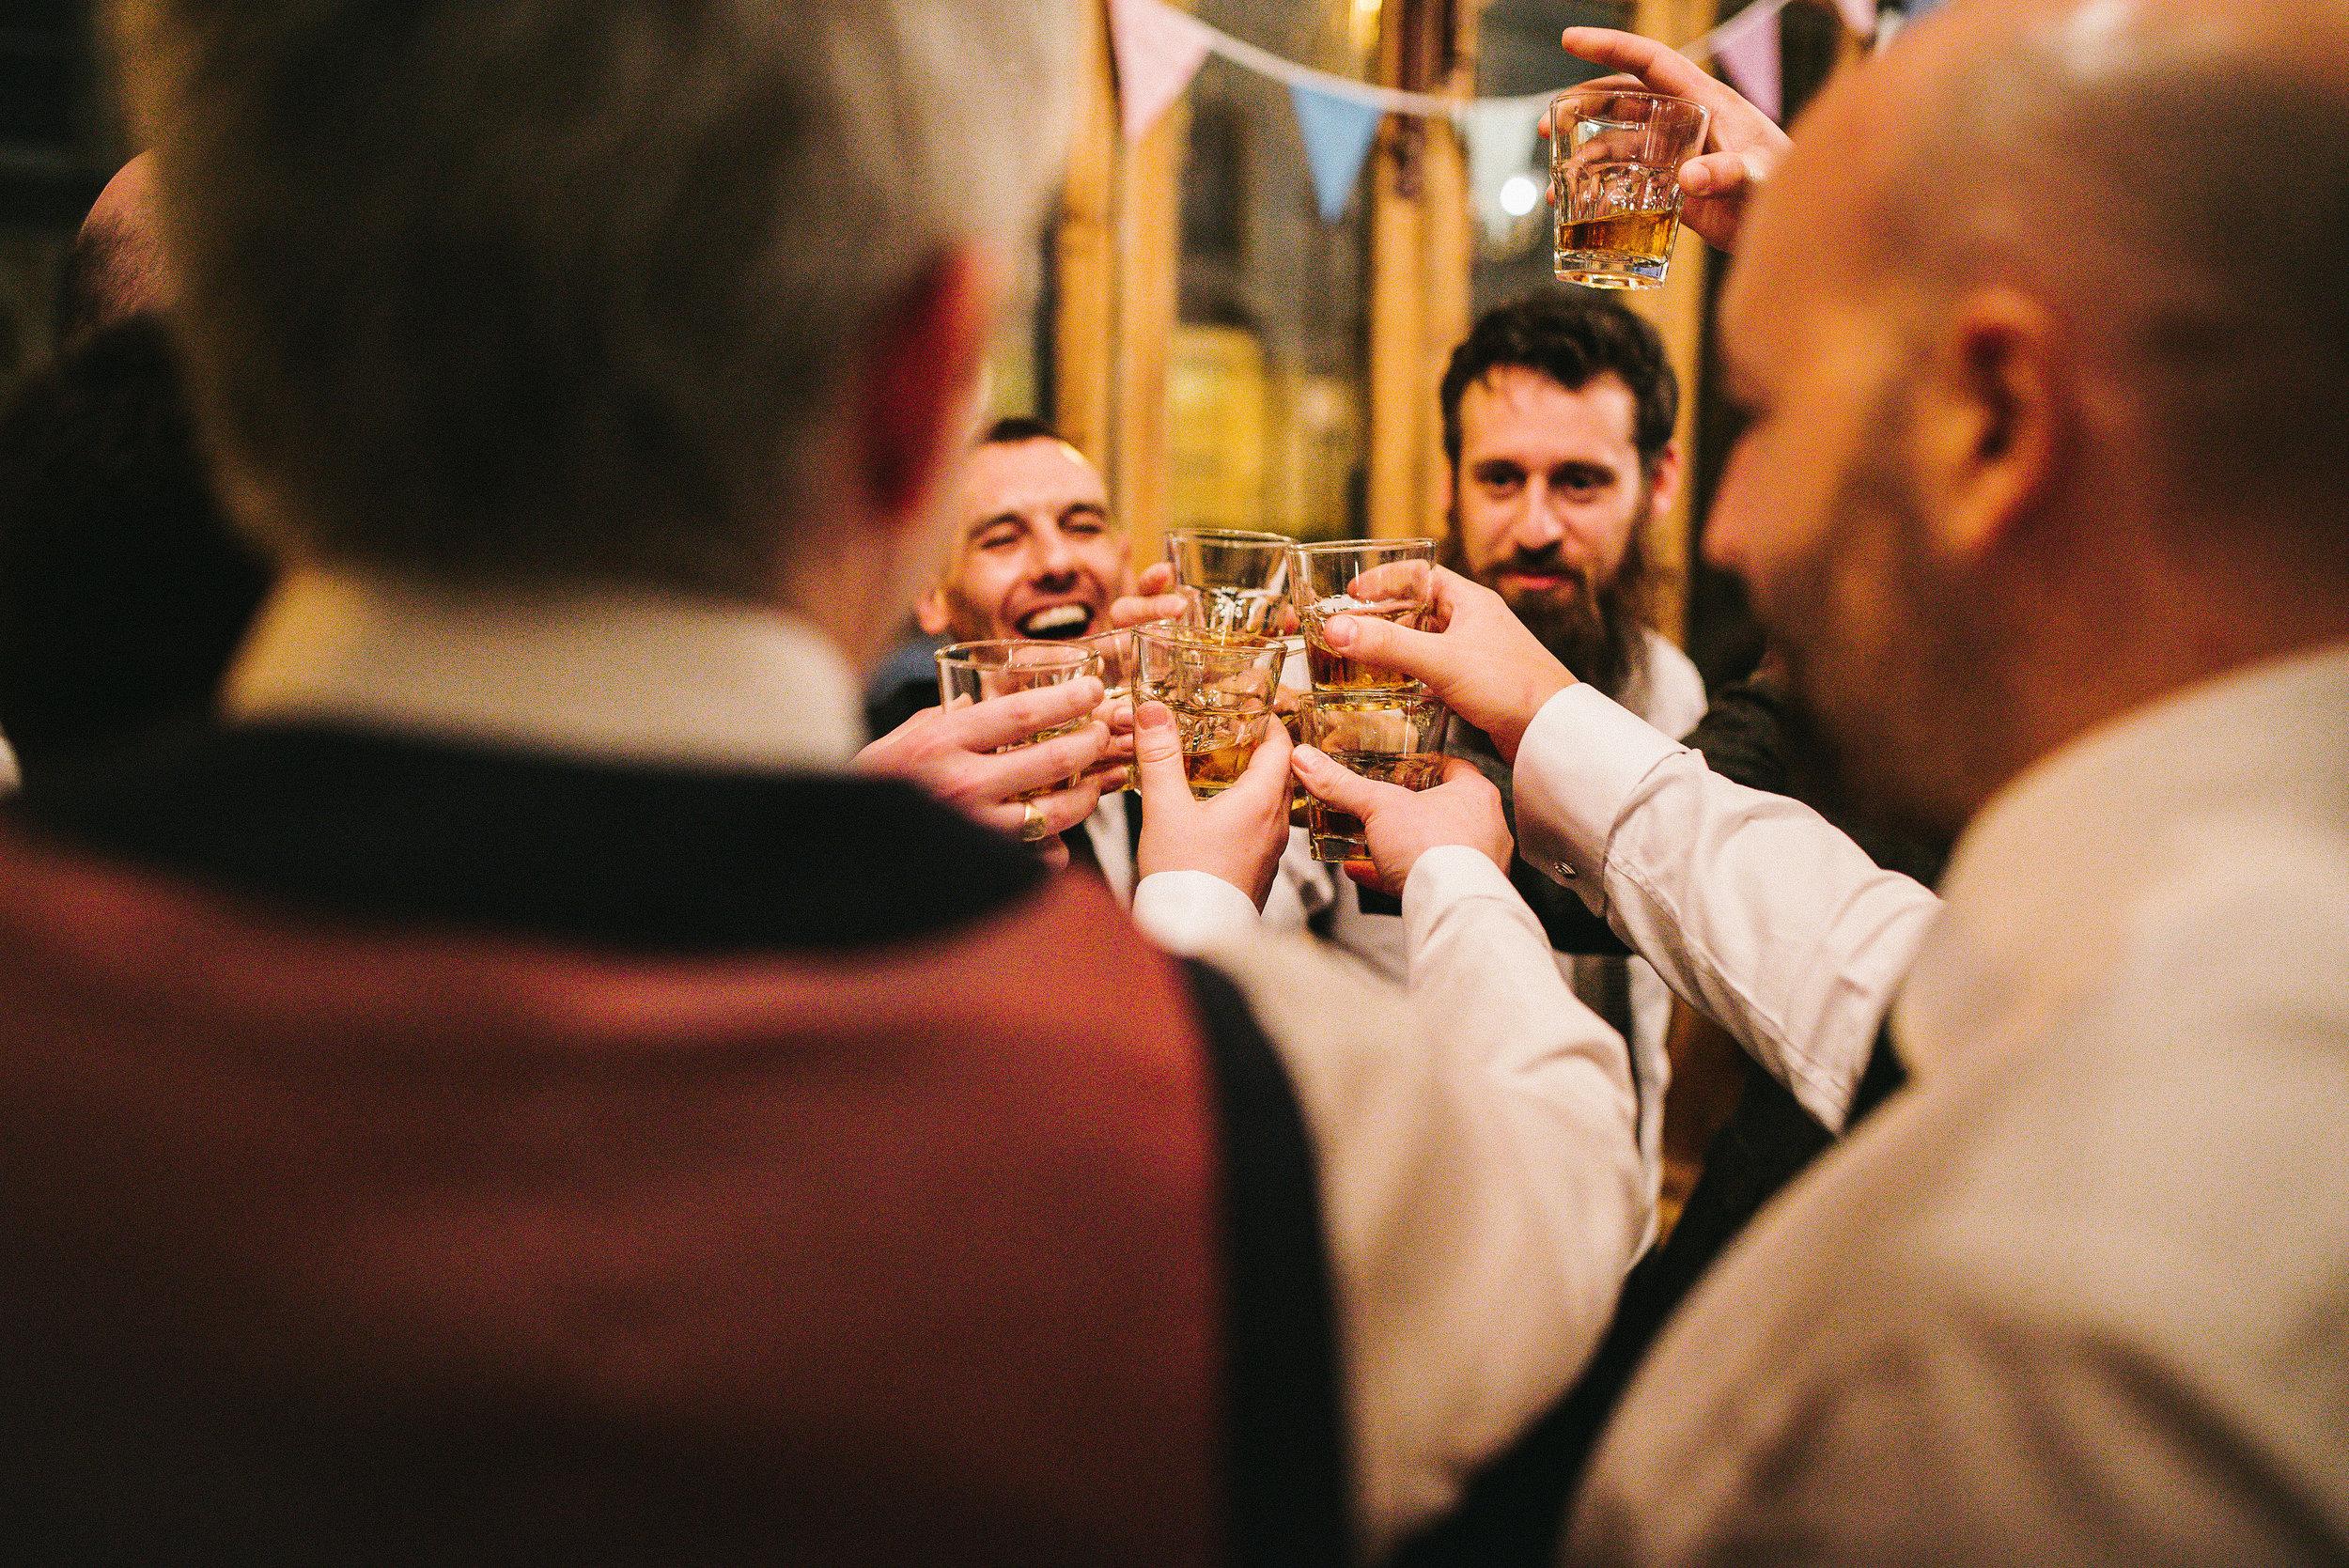 Wedding celebrations Jager bomb